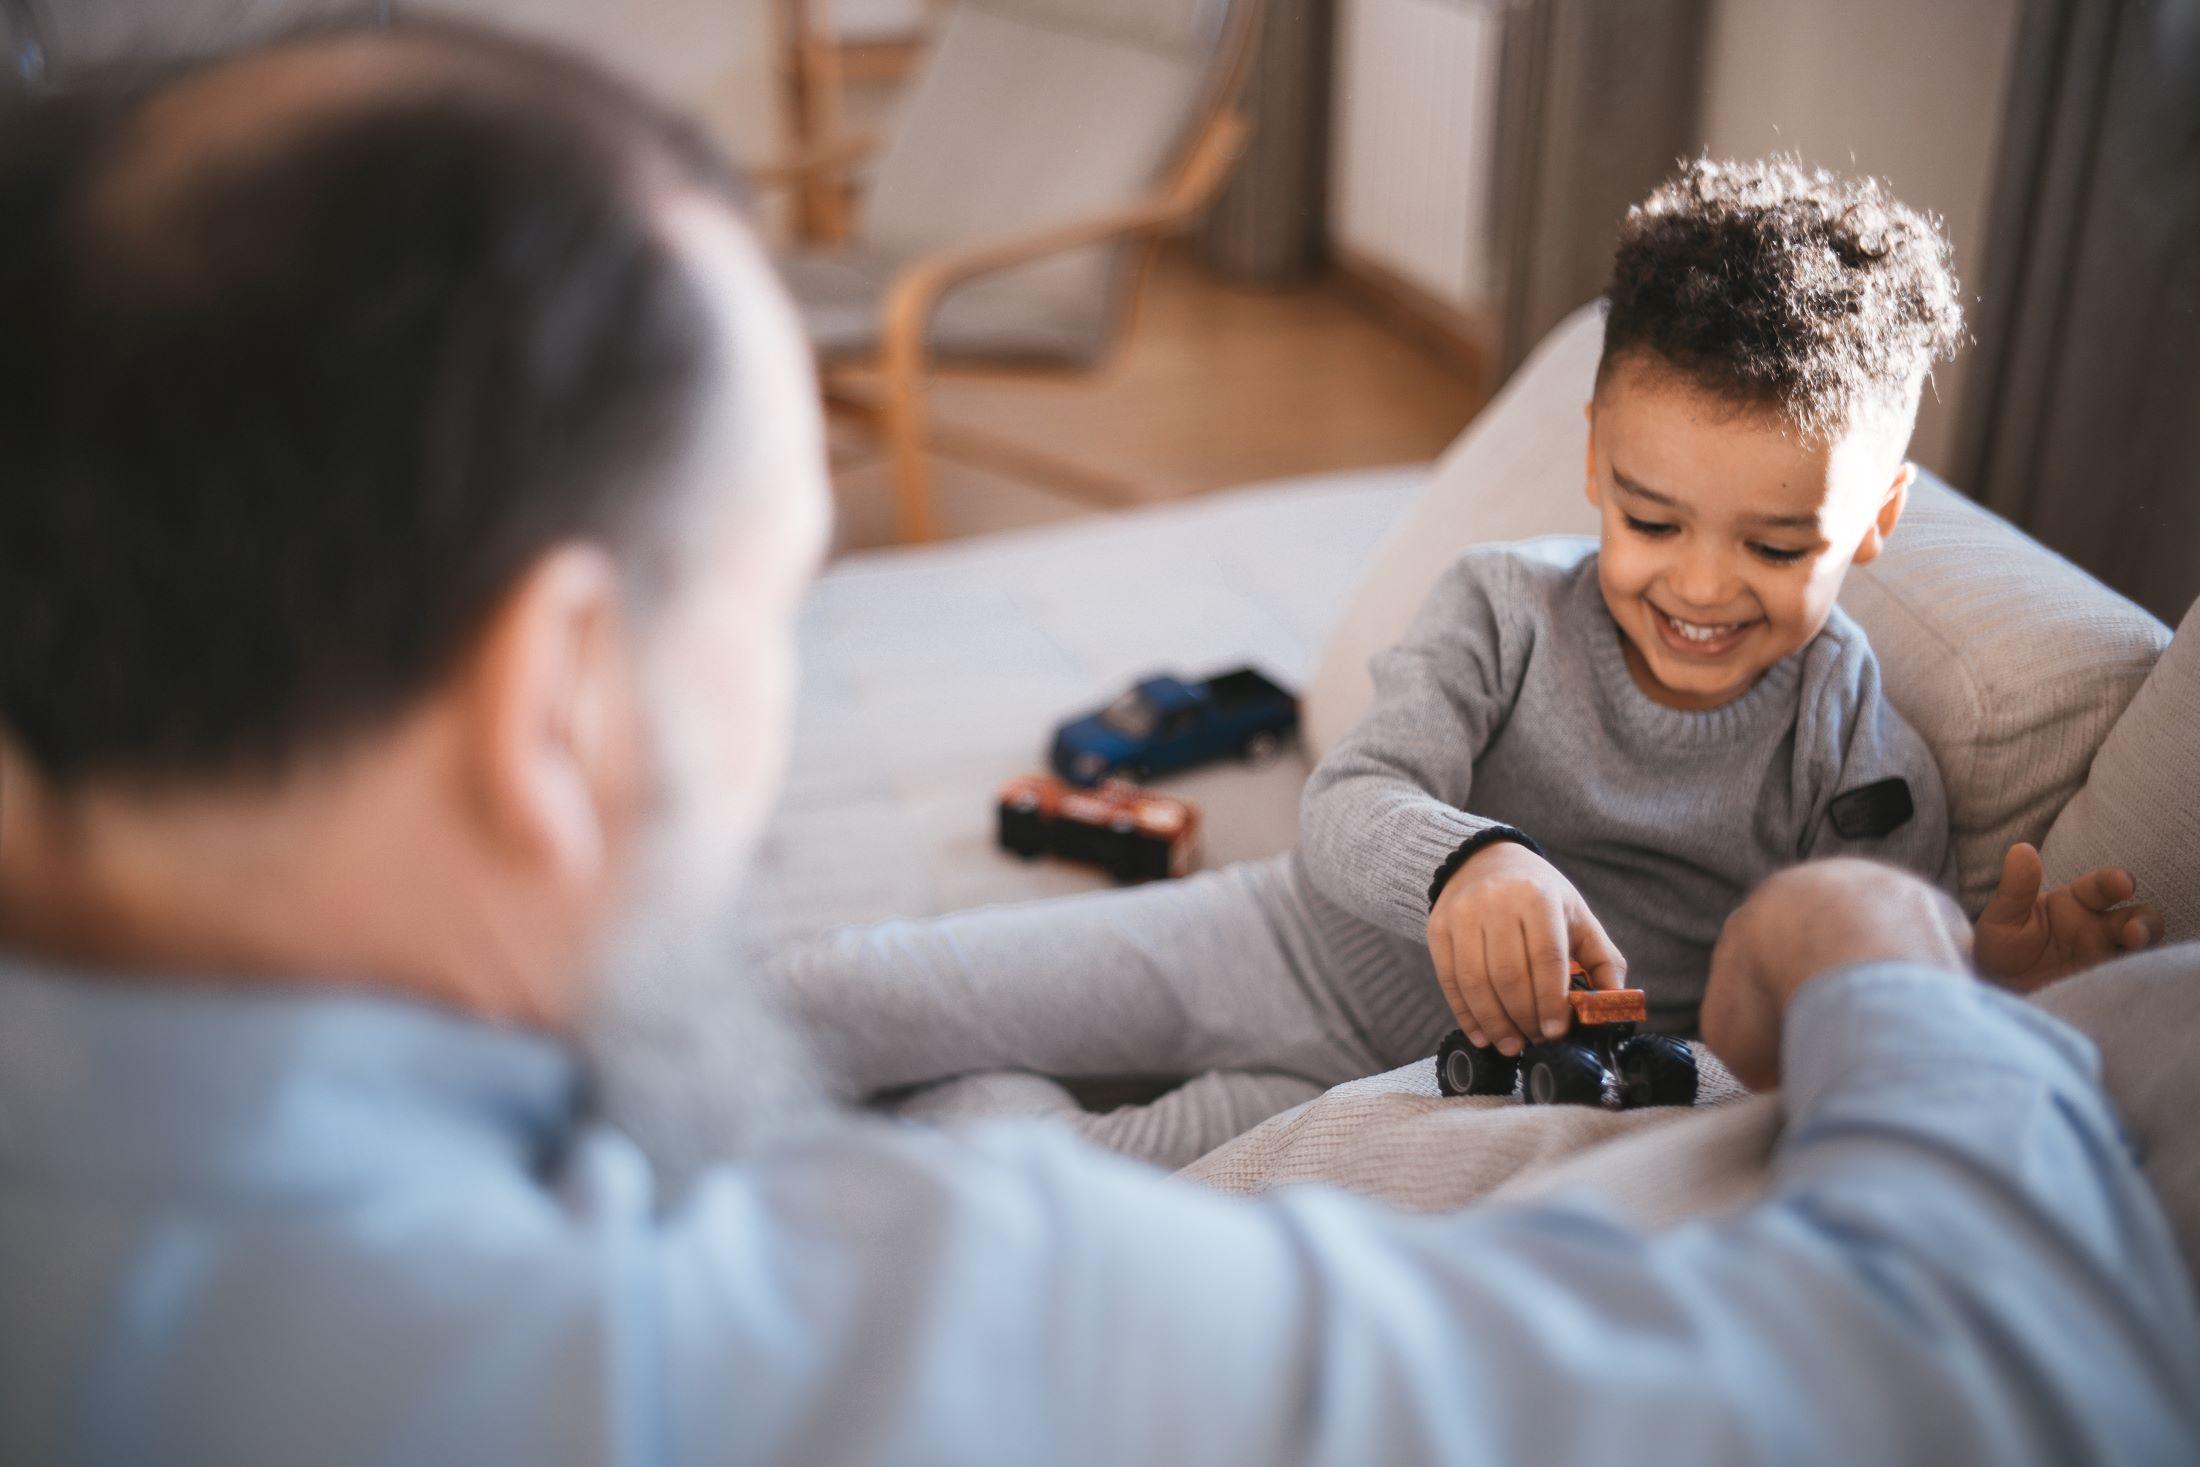 social security myths retirement man grandfather boy grandson home